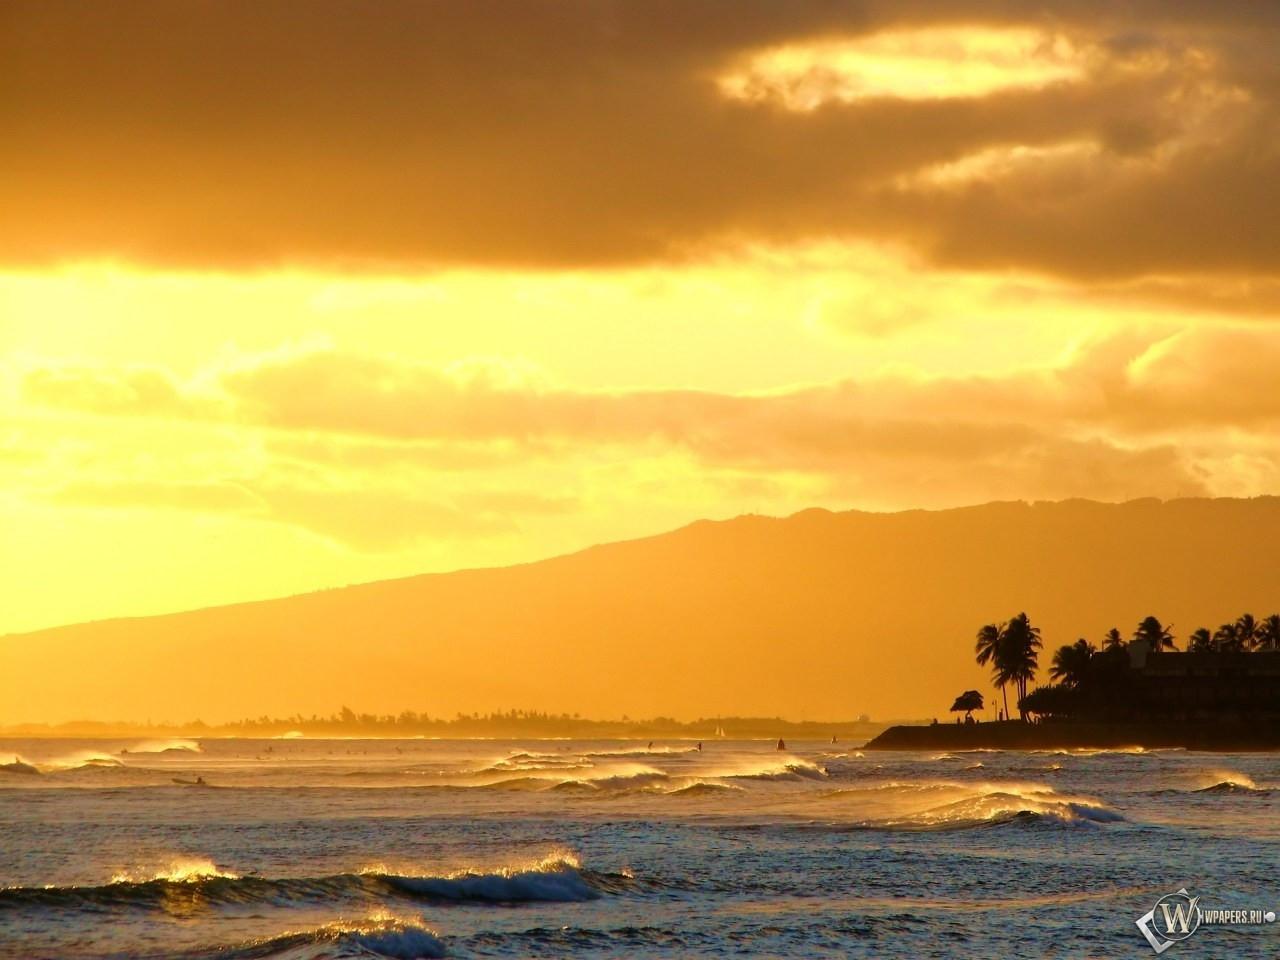 Sunset 1280x960